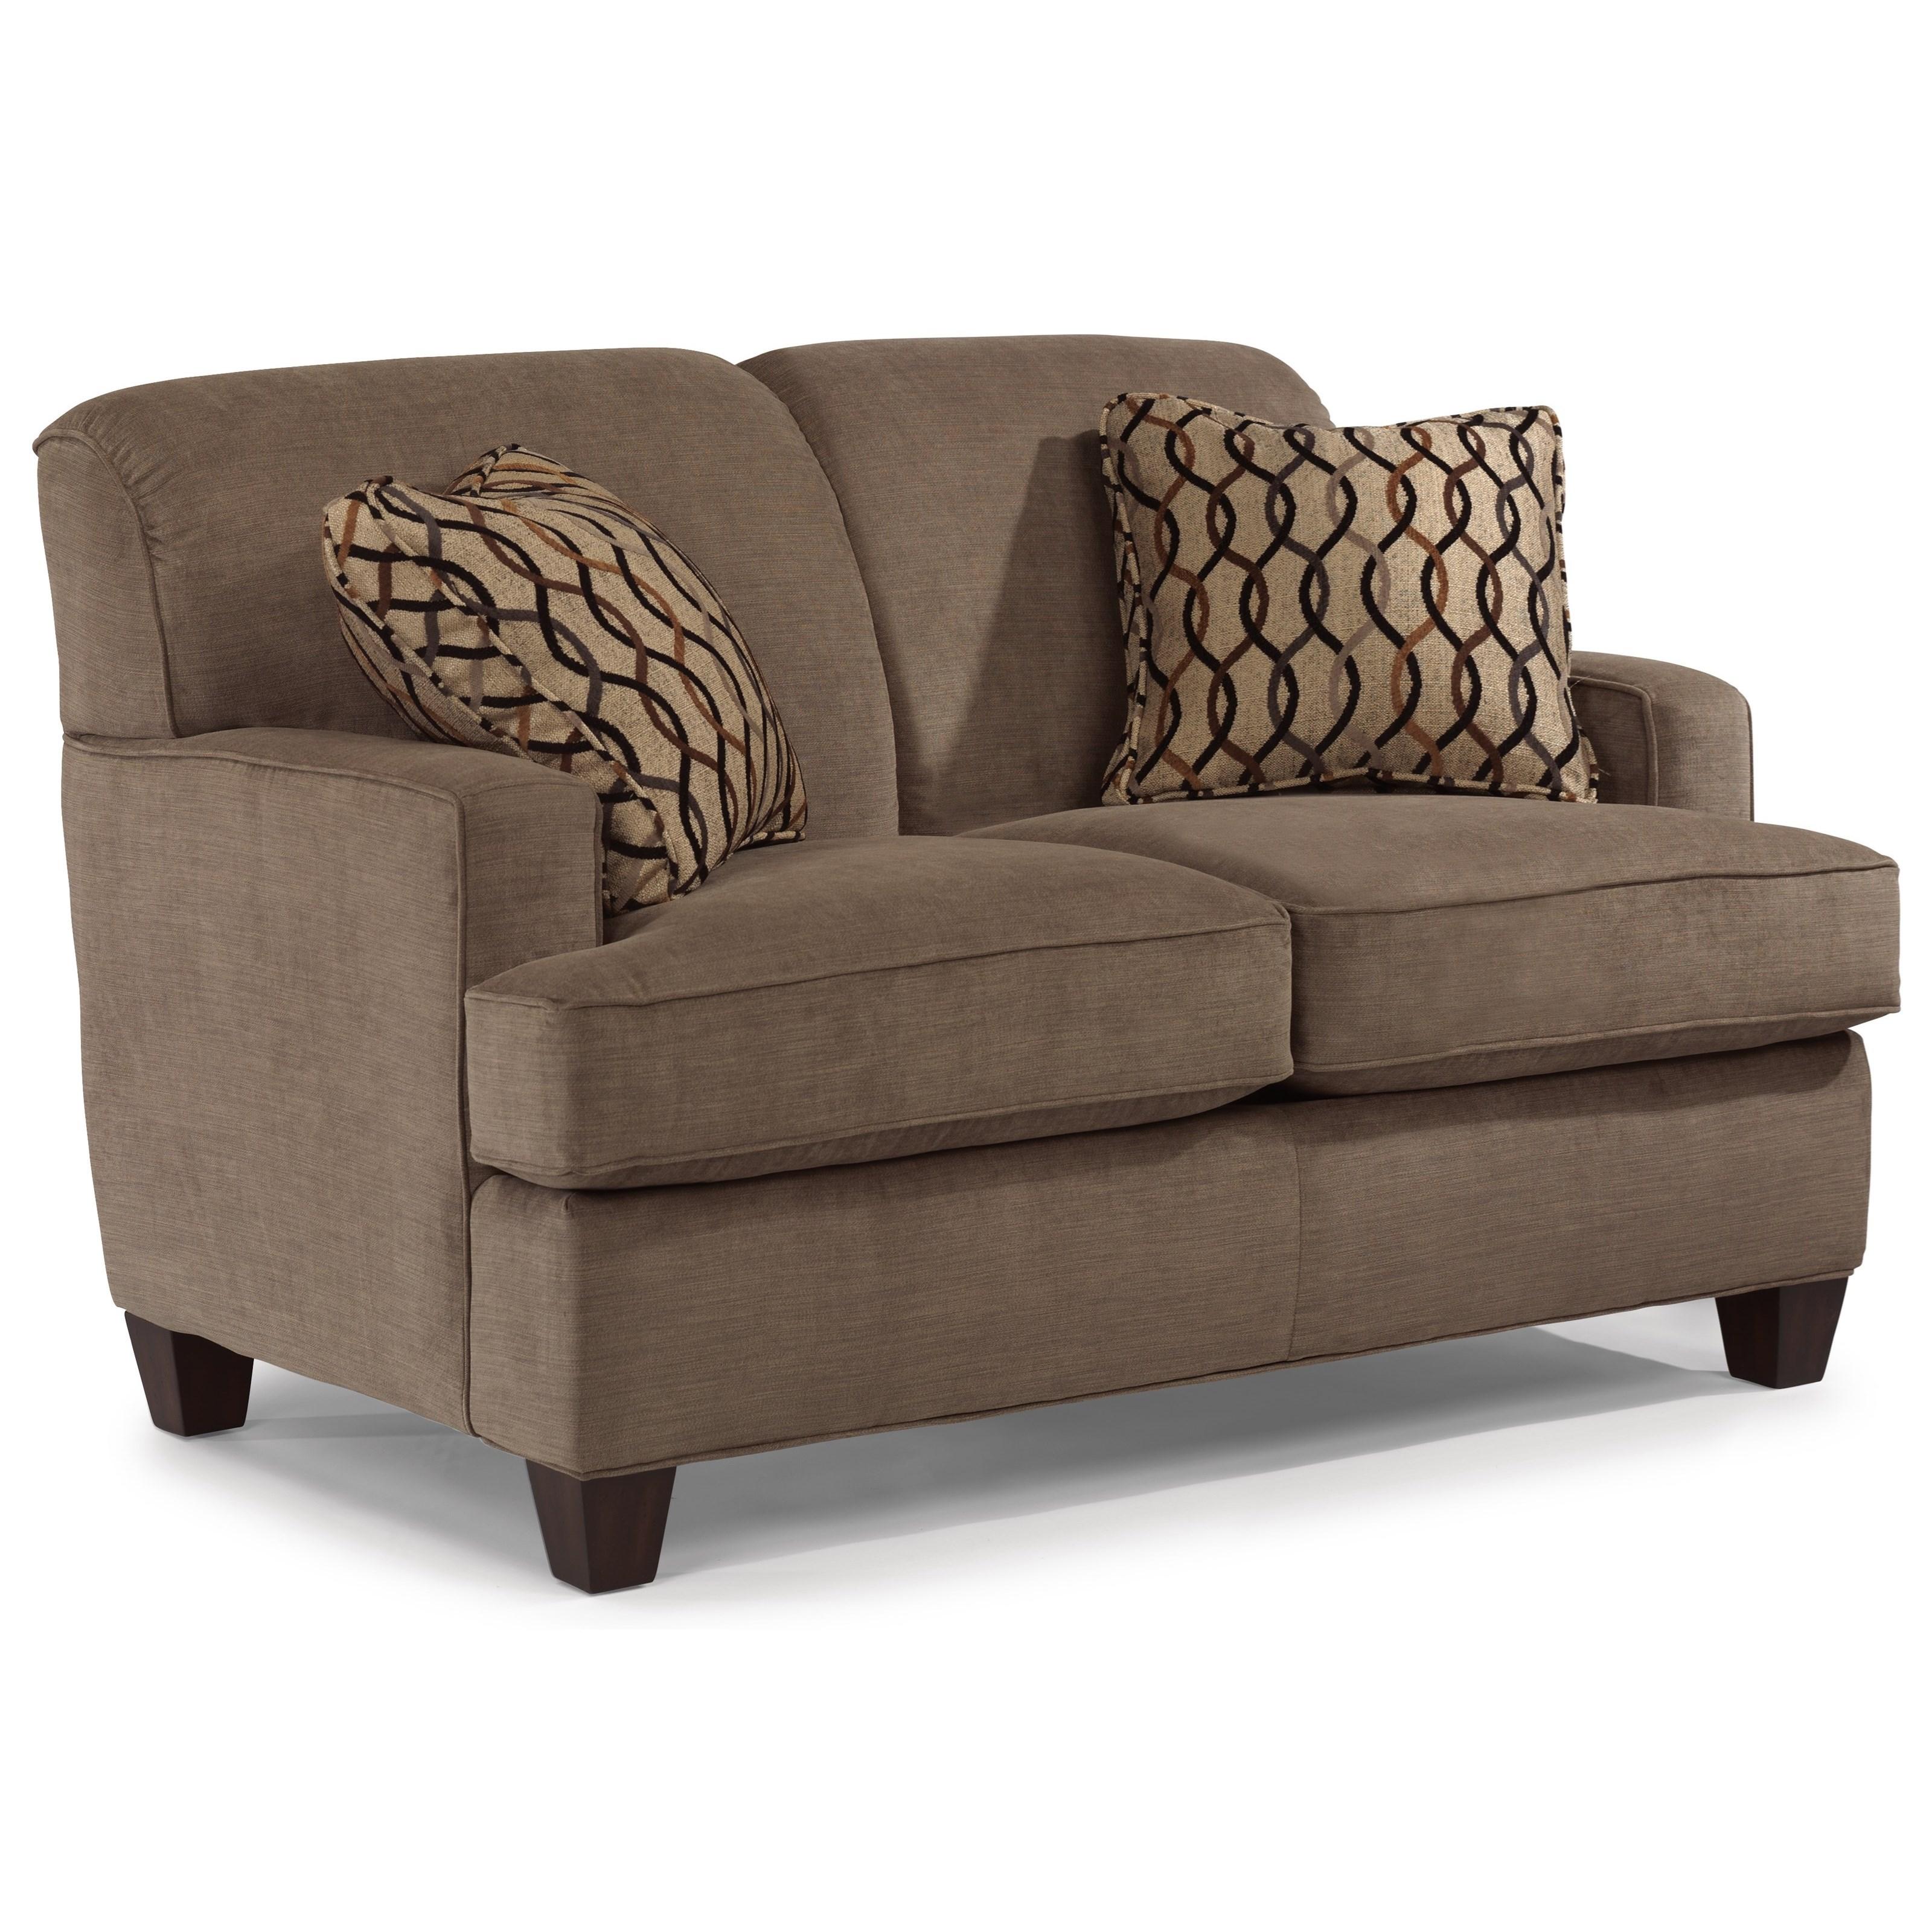 Dempsey Loveseat by Flexsteel at Steger's Furniture